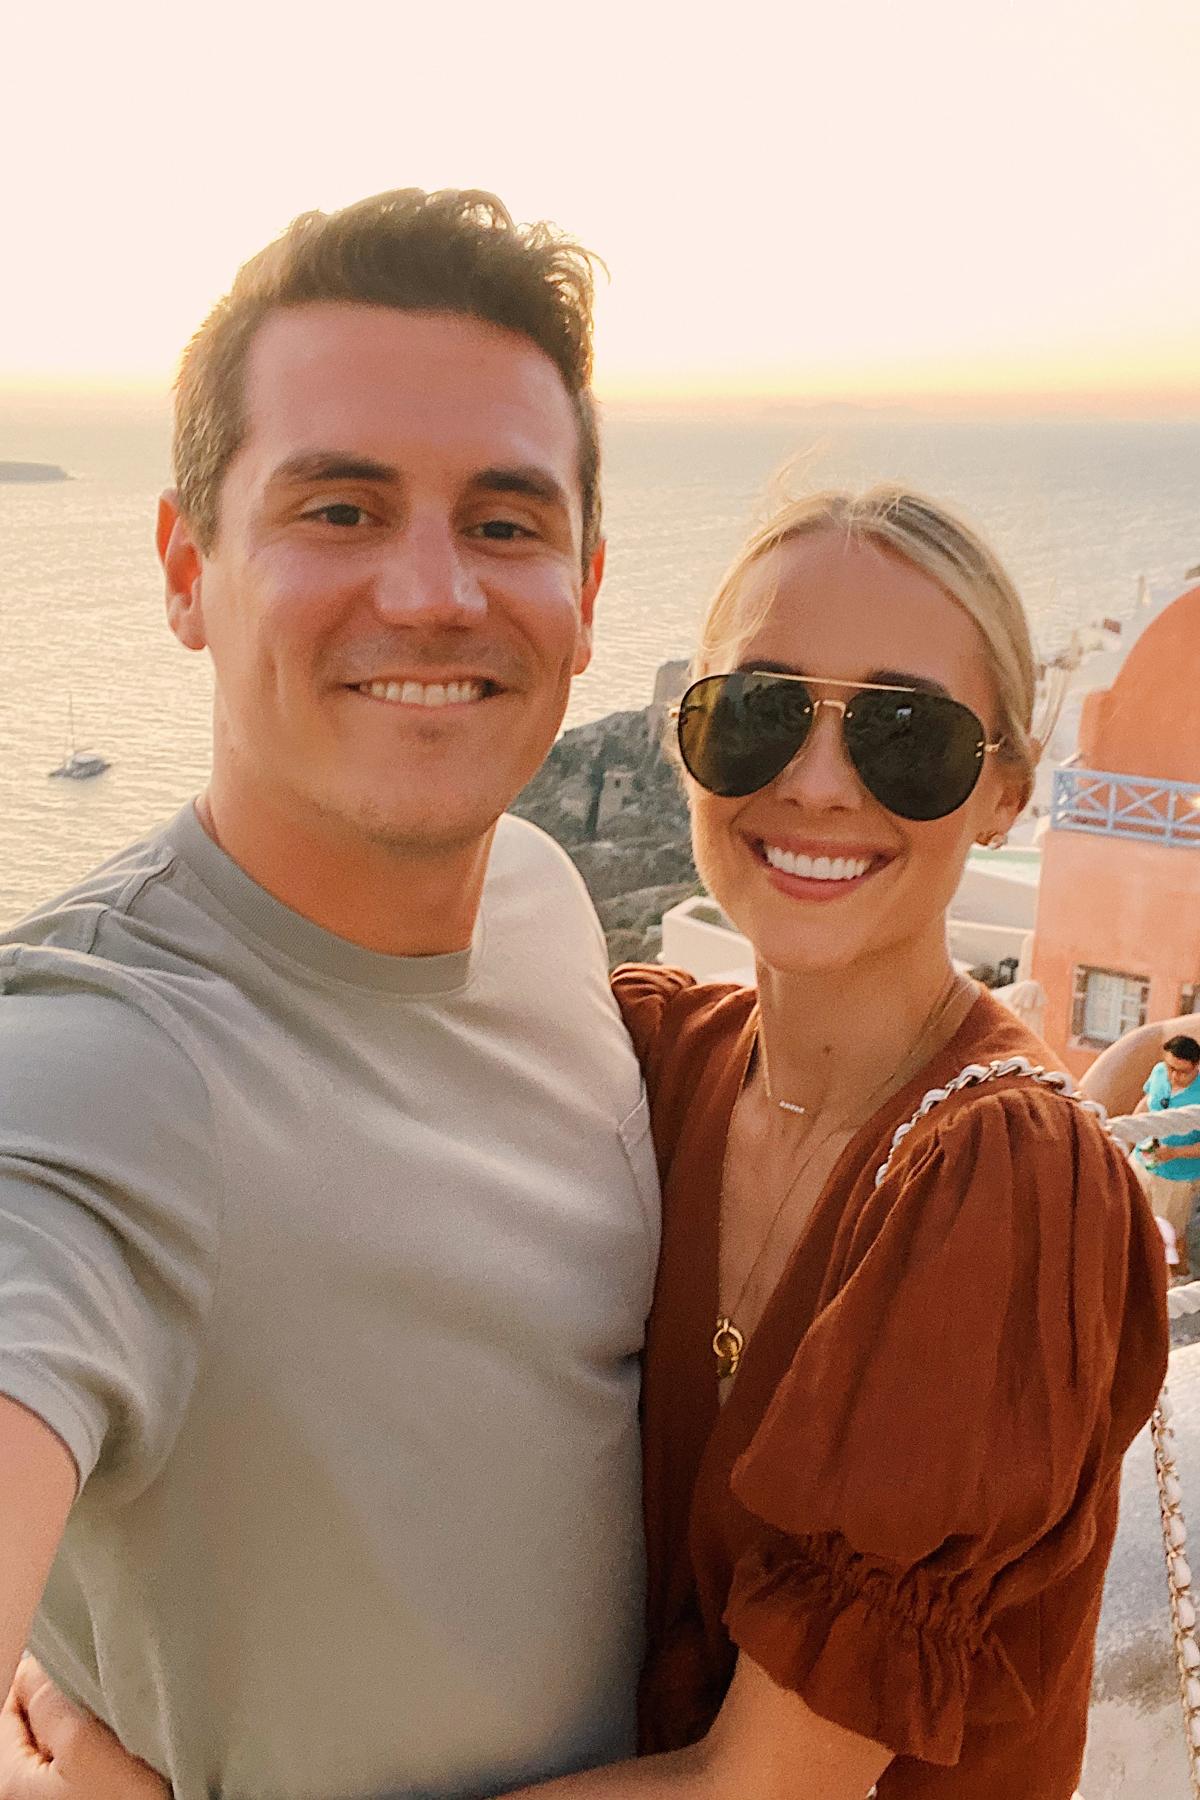 Fashion Jackson and Husband in Greece